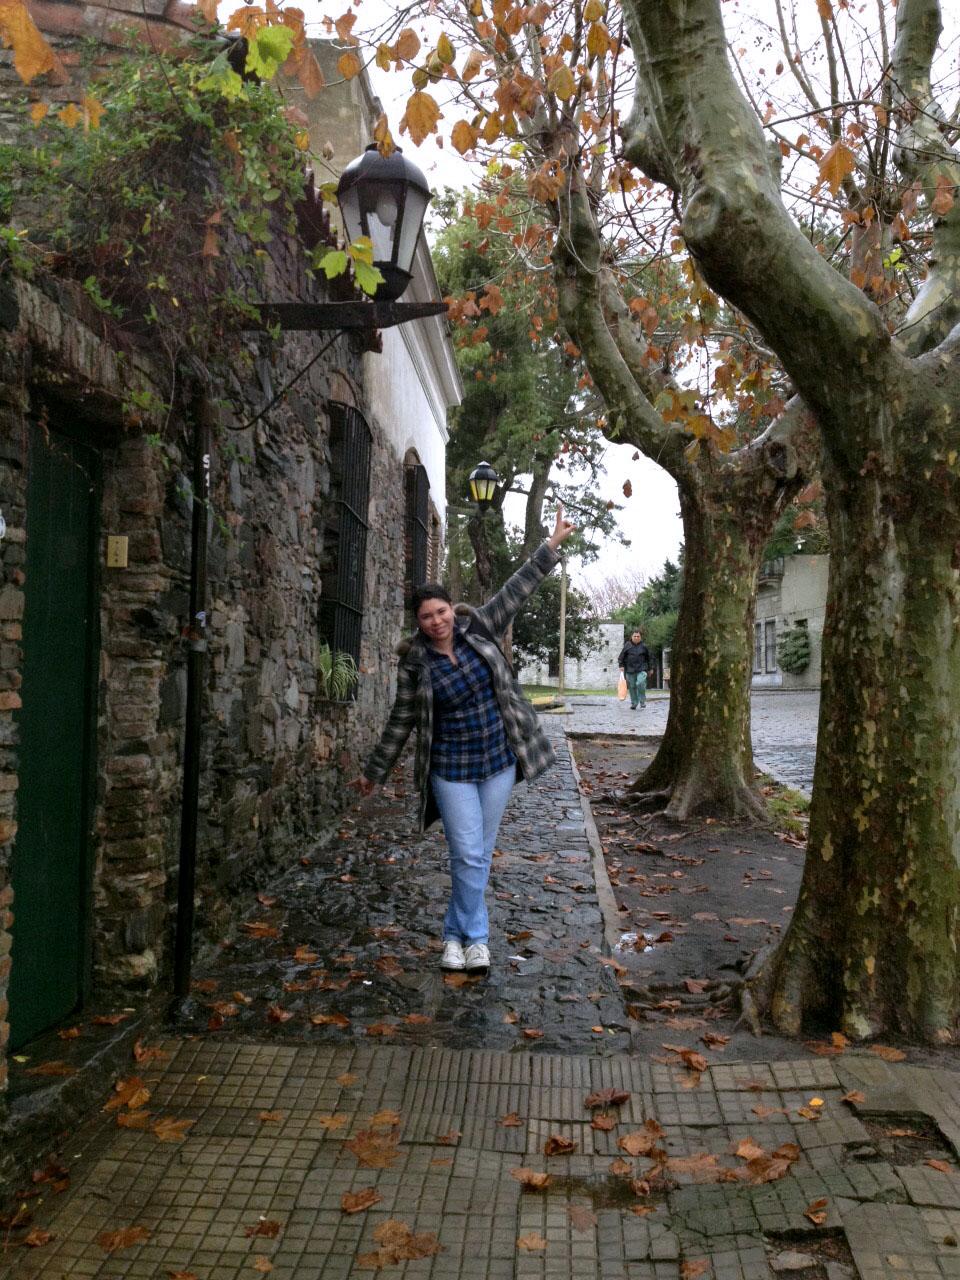 erika nas ruas de colonia del sacramento